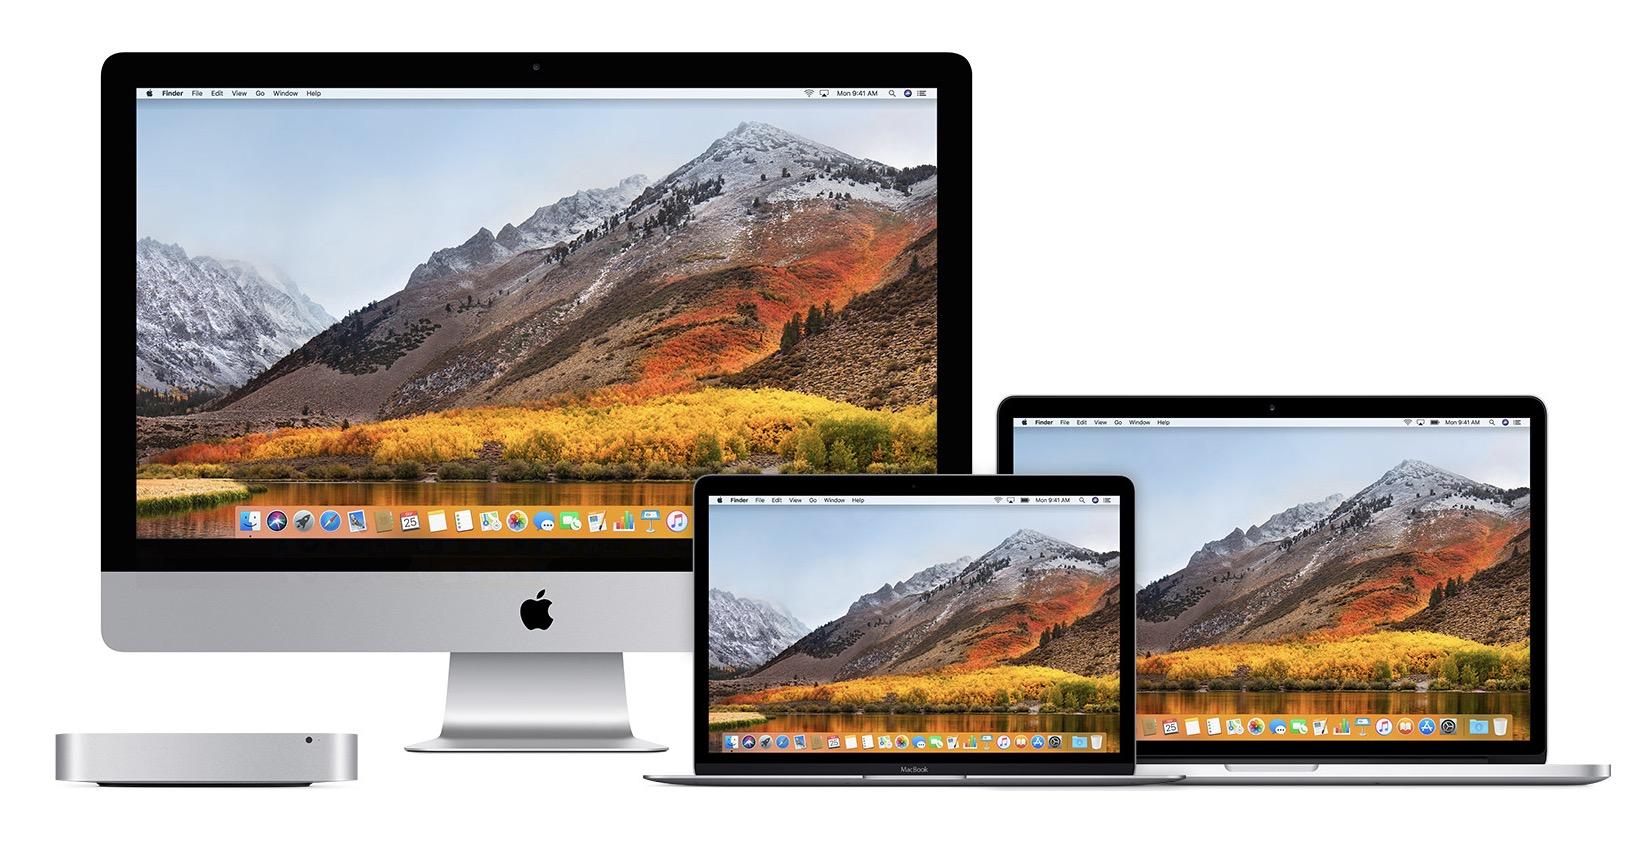 back to my mac icloud